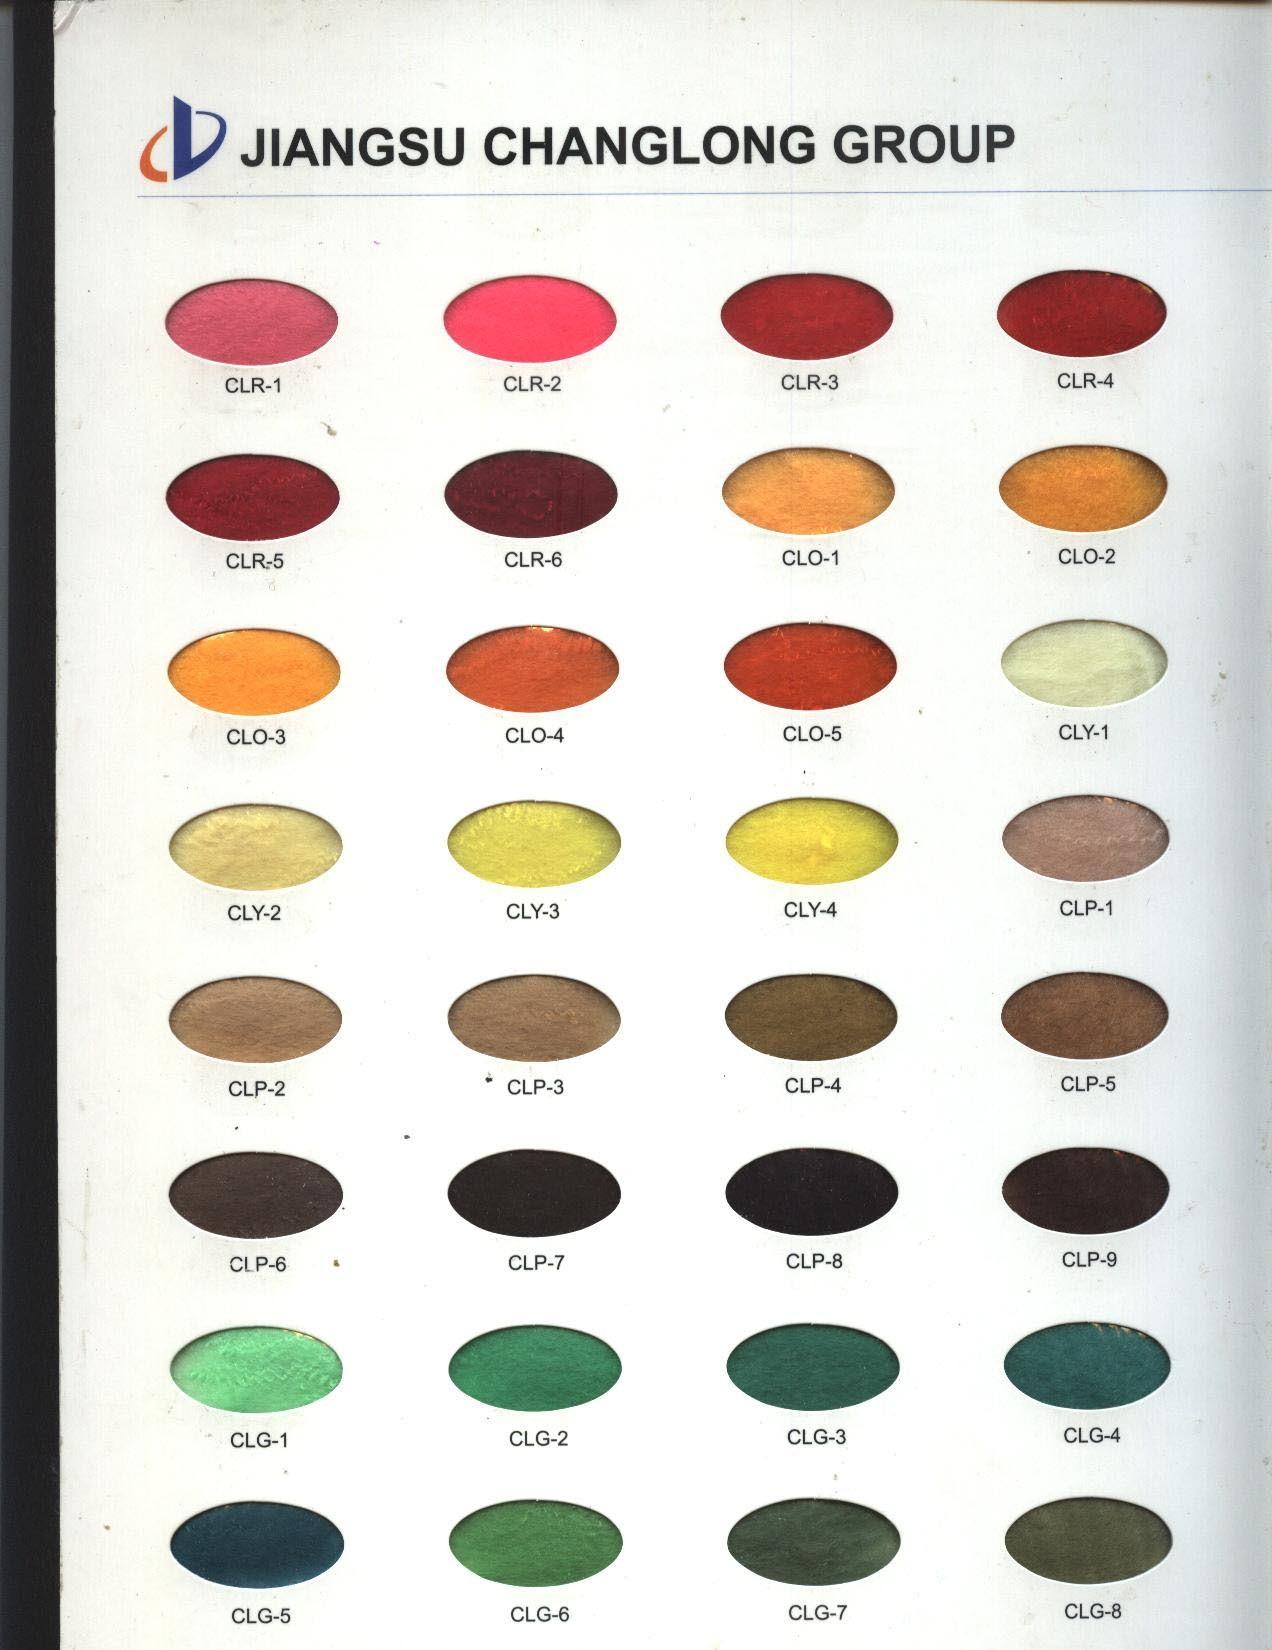 Colorful PP Polypropylene Staple Fiber